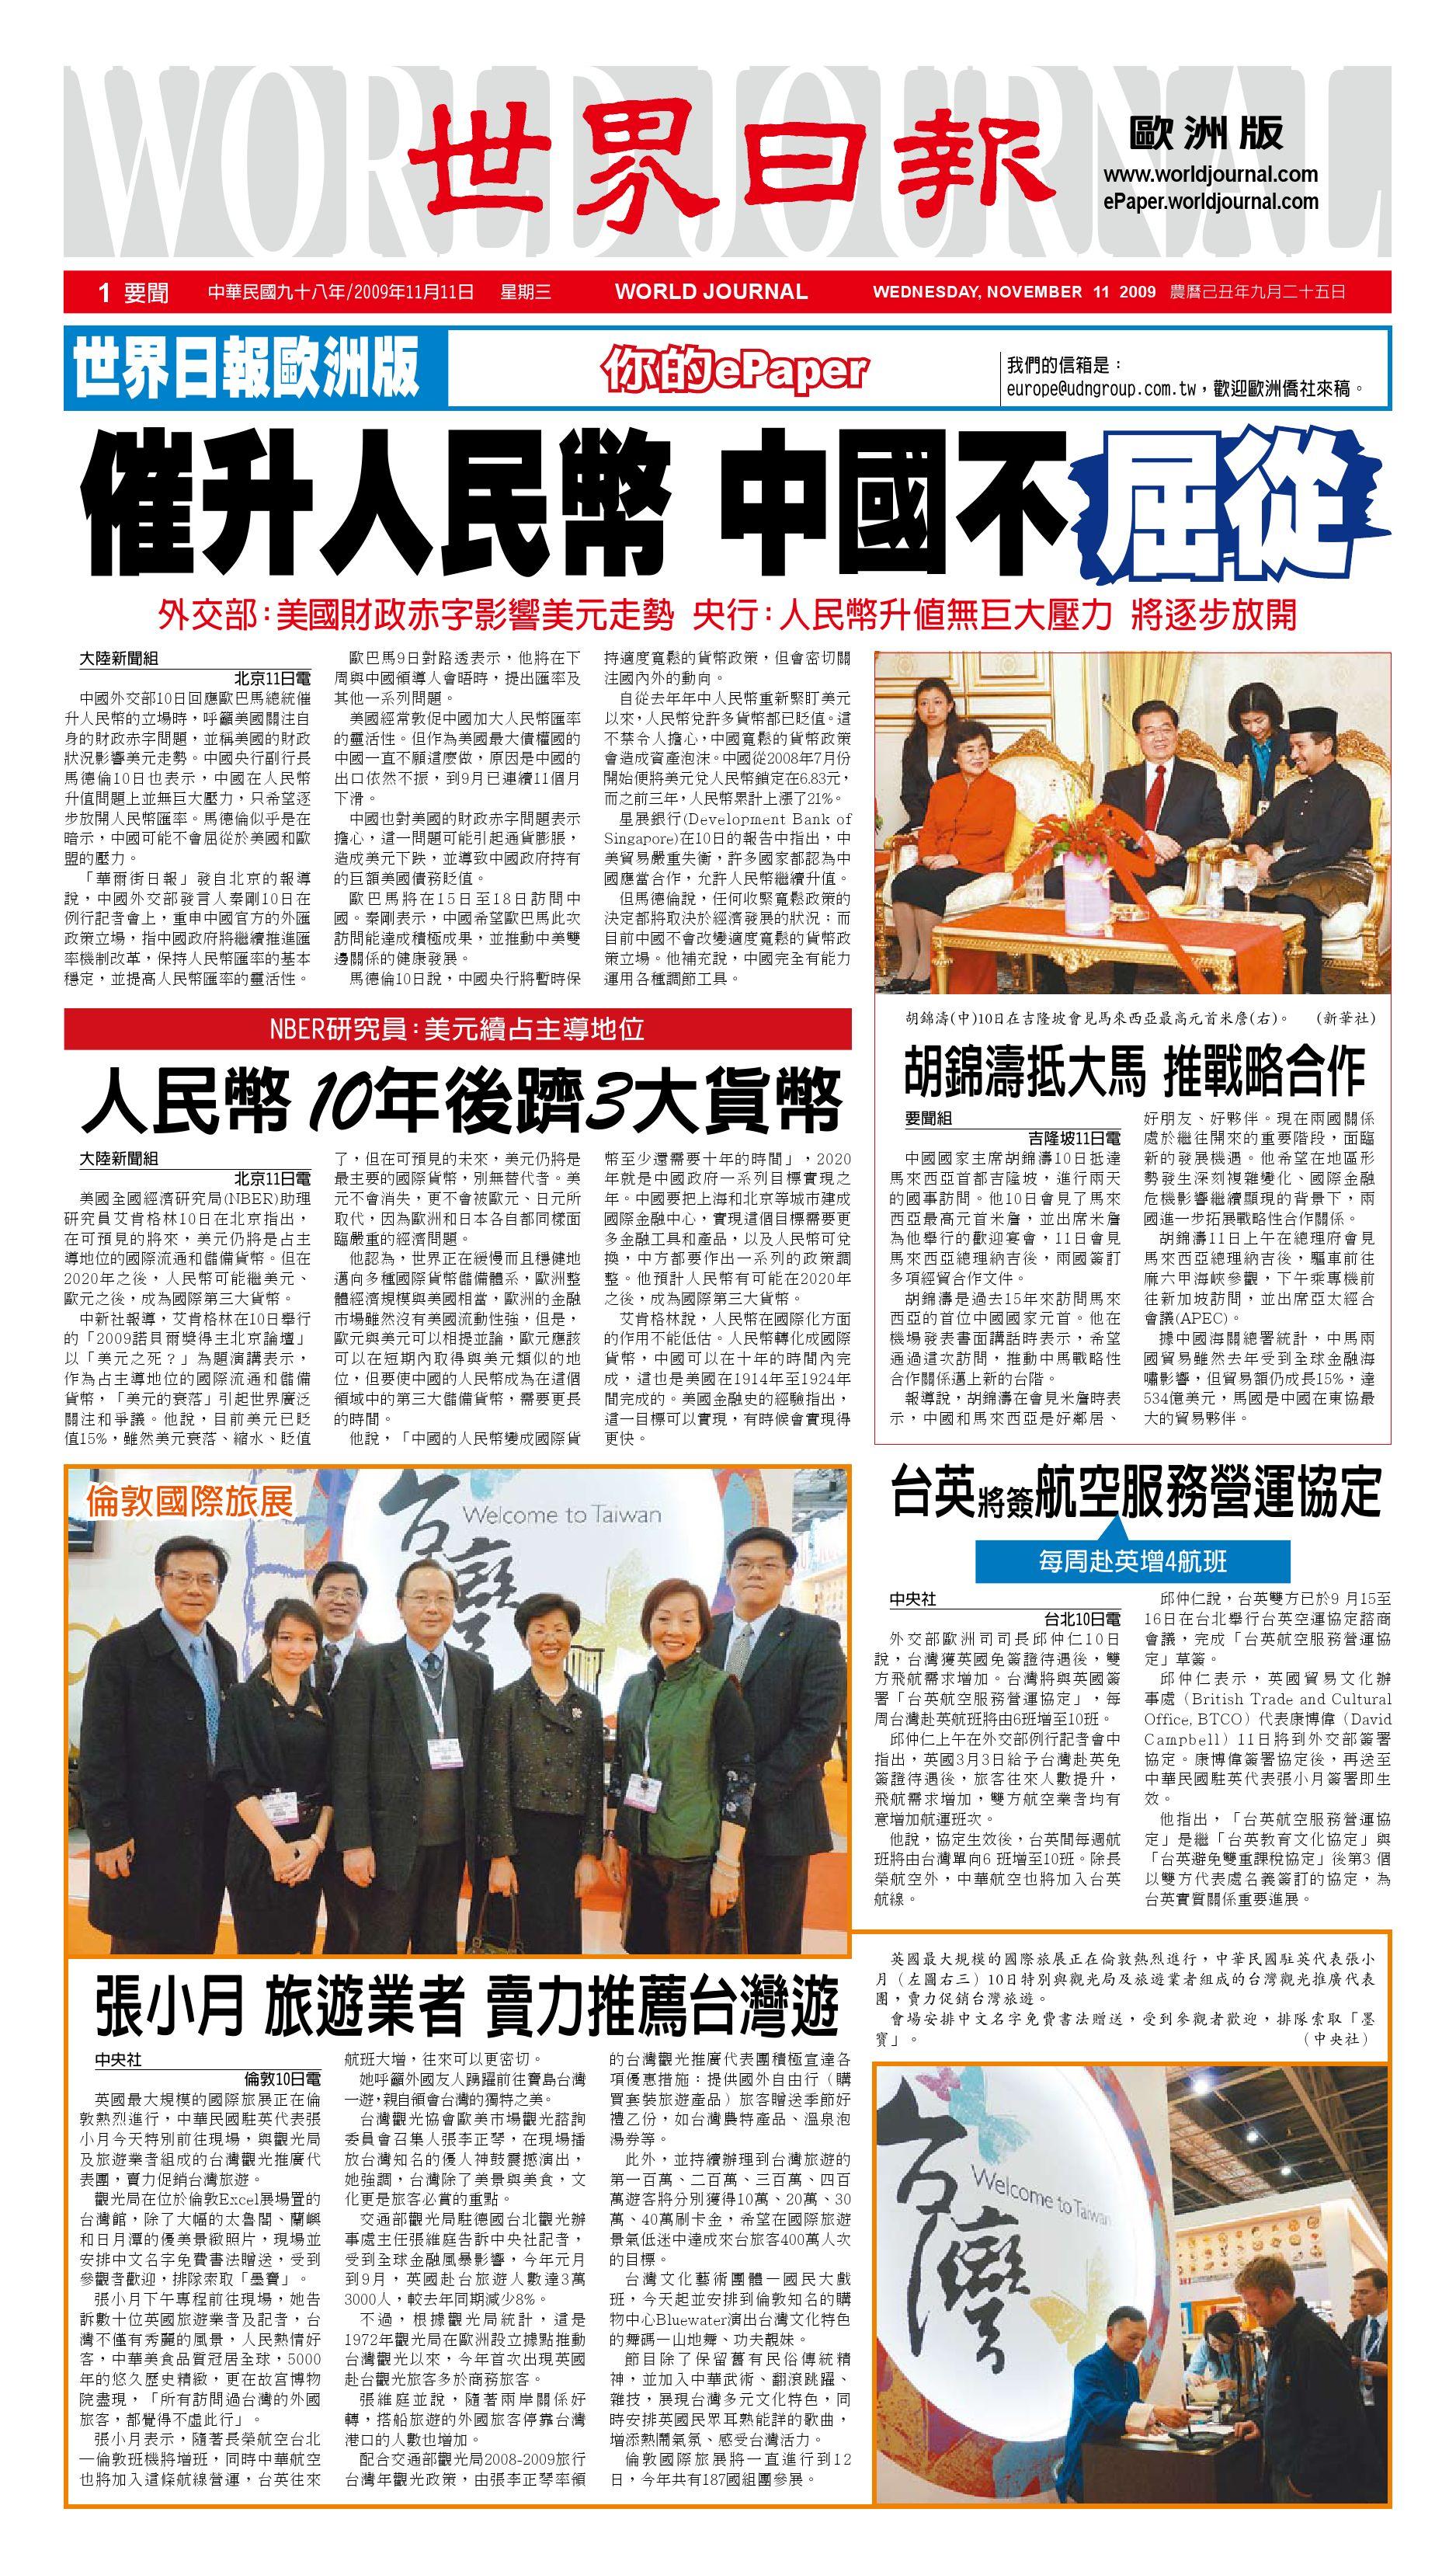 fbb90782d1b60 歐洲日報1111 by World Journal - issuu